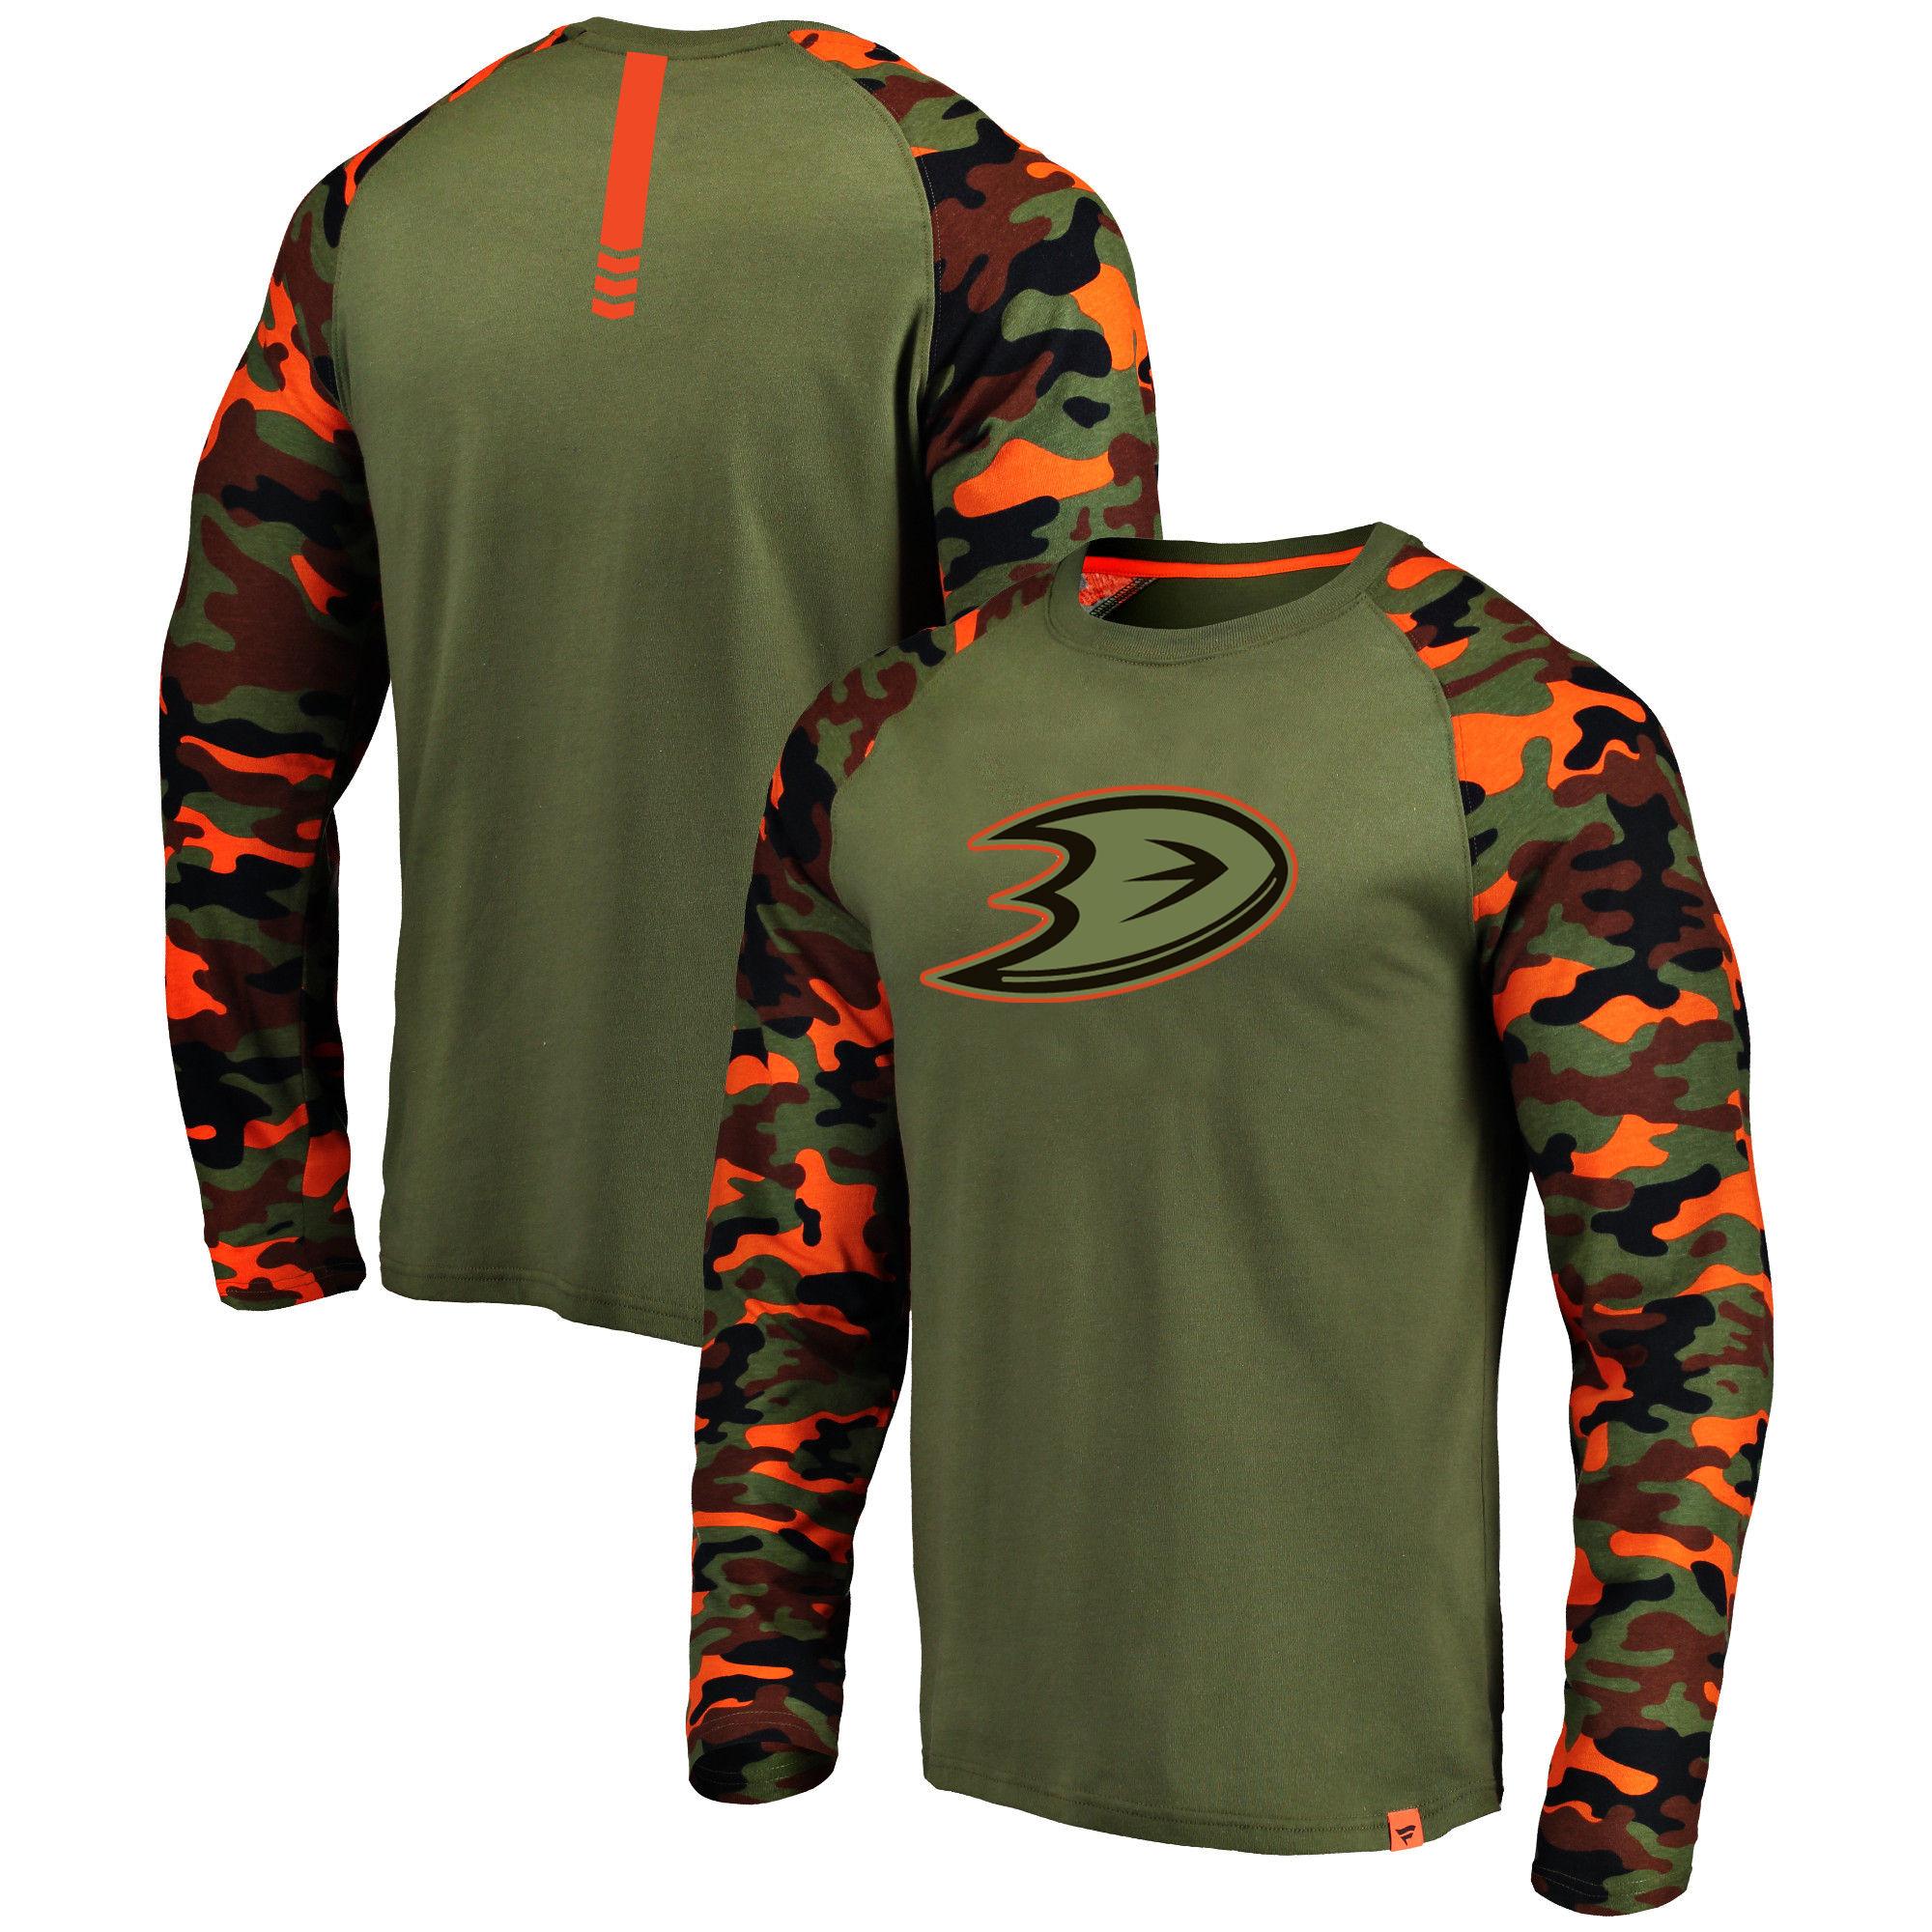 Anaheim Ducks Fanatics Branded Olive/Camo Recon Long Sleeve Raglan T-Shirt